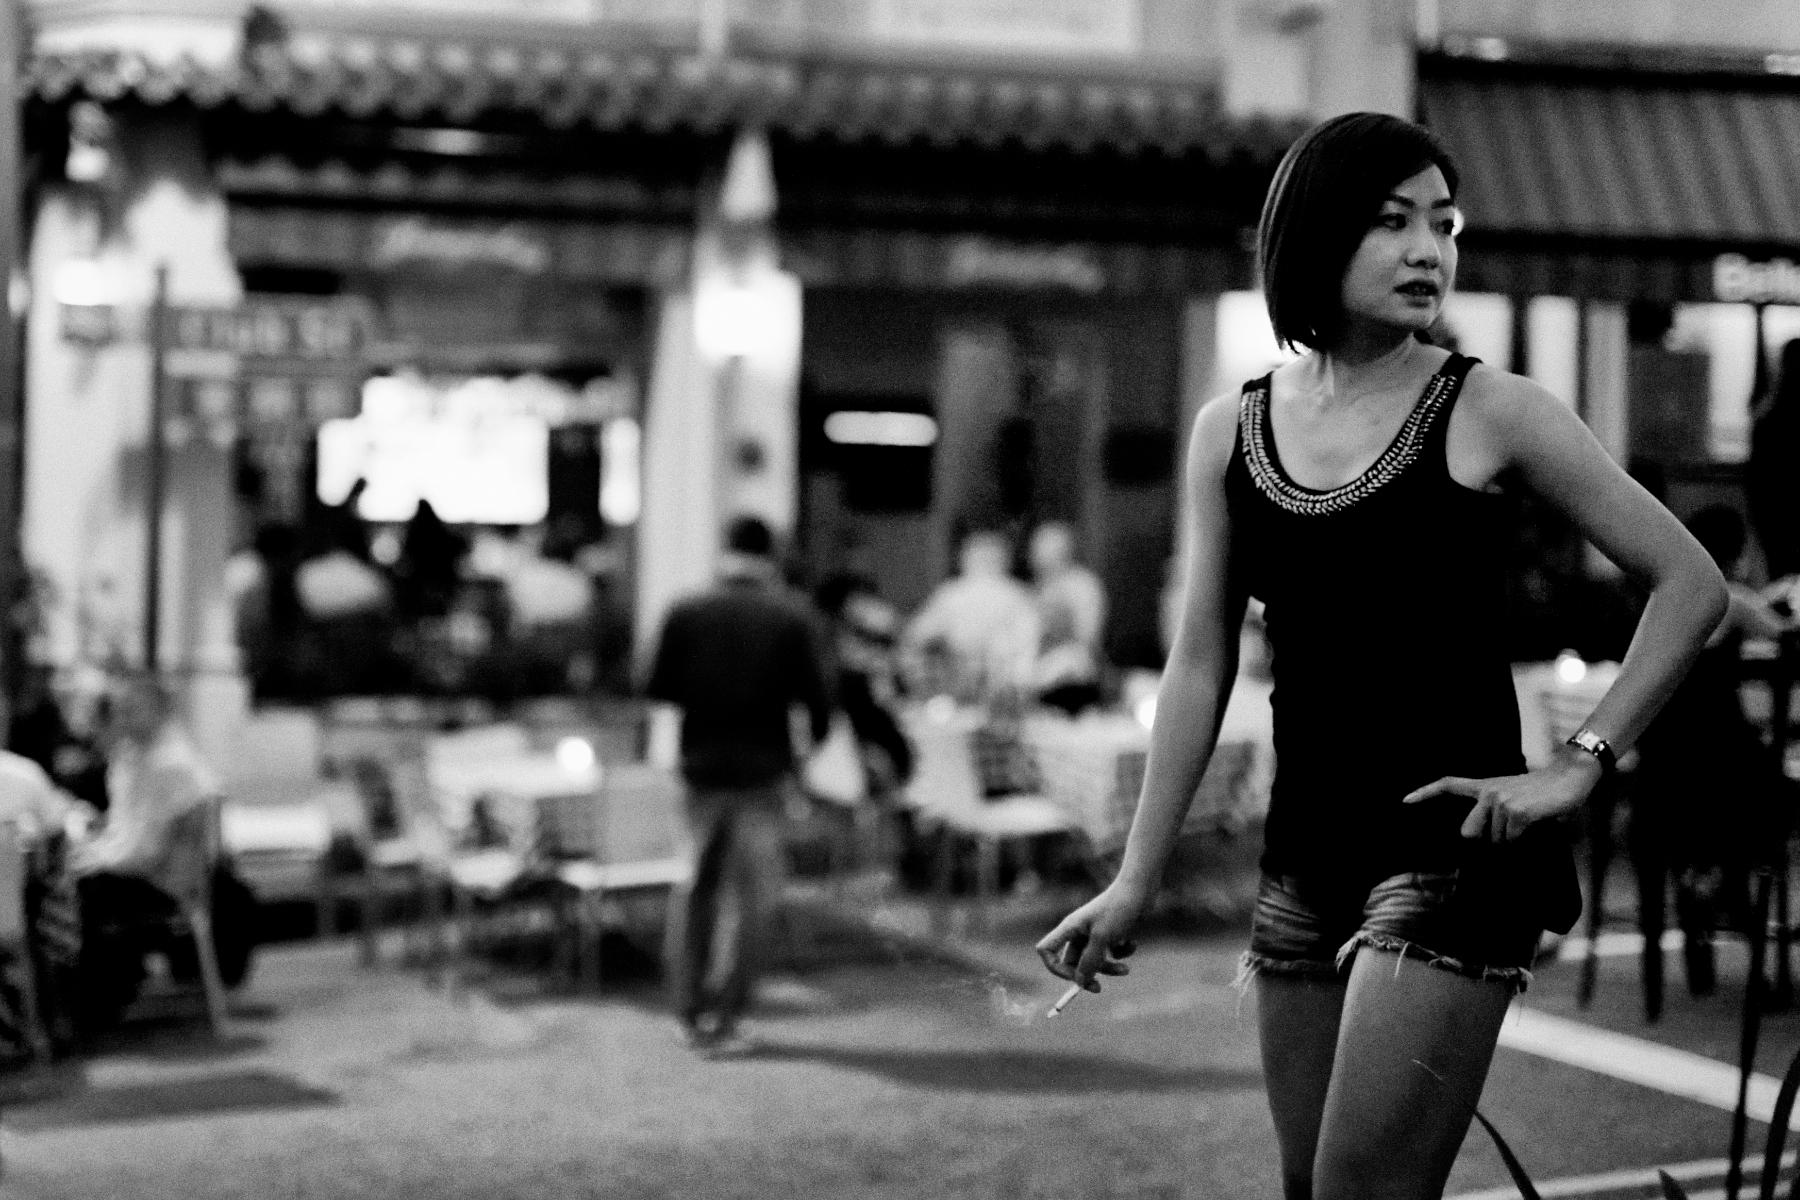 Wallpaper street night singapore vehicle road smoke smoking evening standing nikon infrastructure art beautiful girl woman fun style